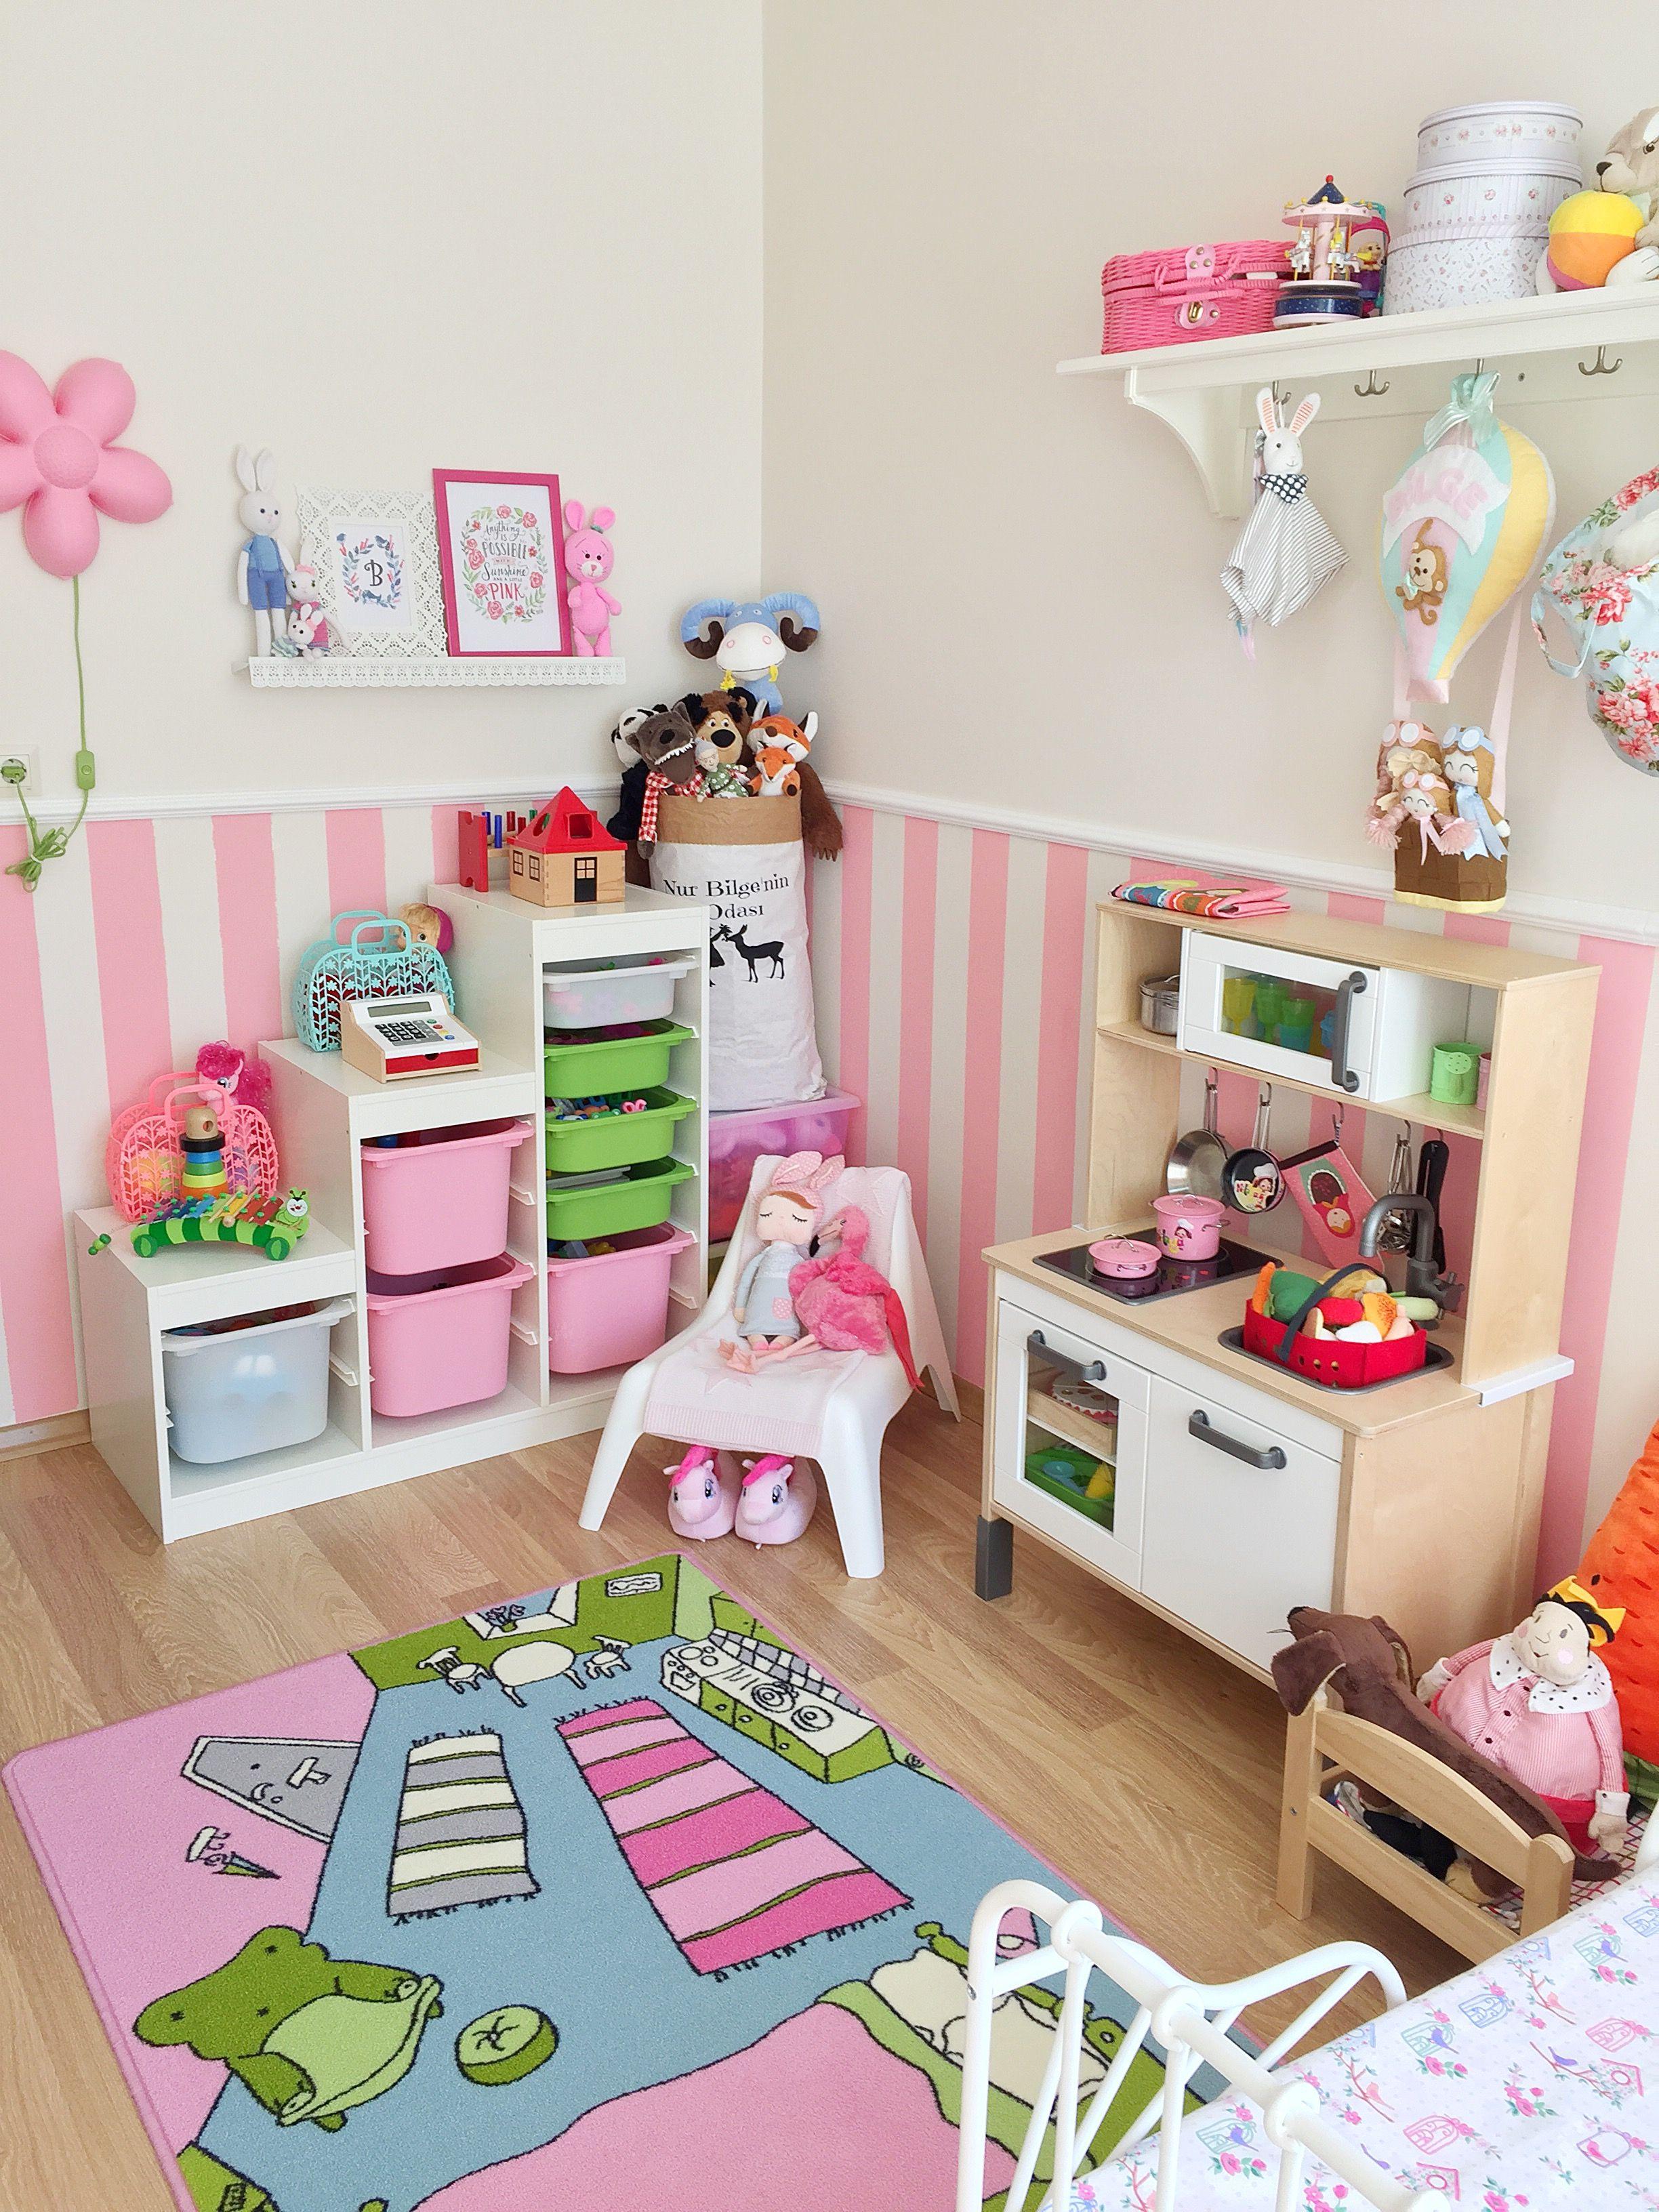 Playroom Ideas Playroom Organization Playroom Decor Playroom